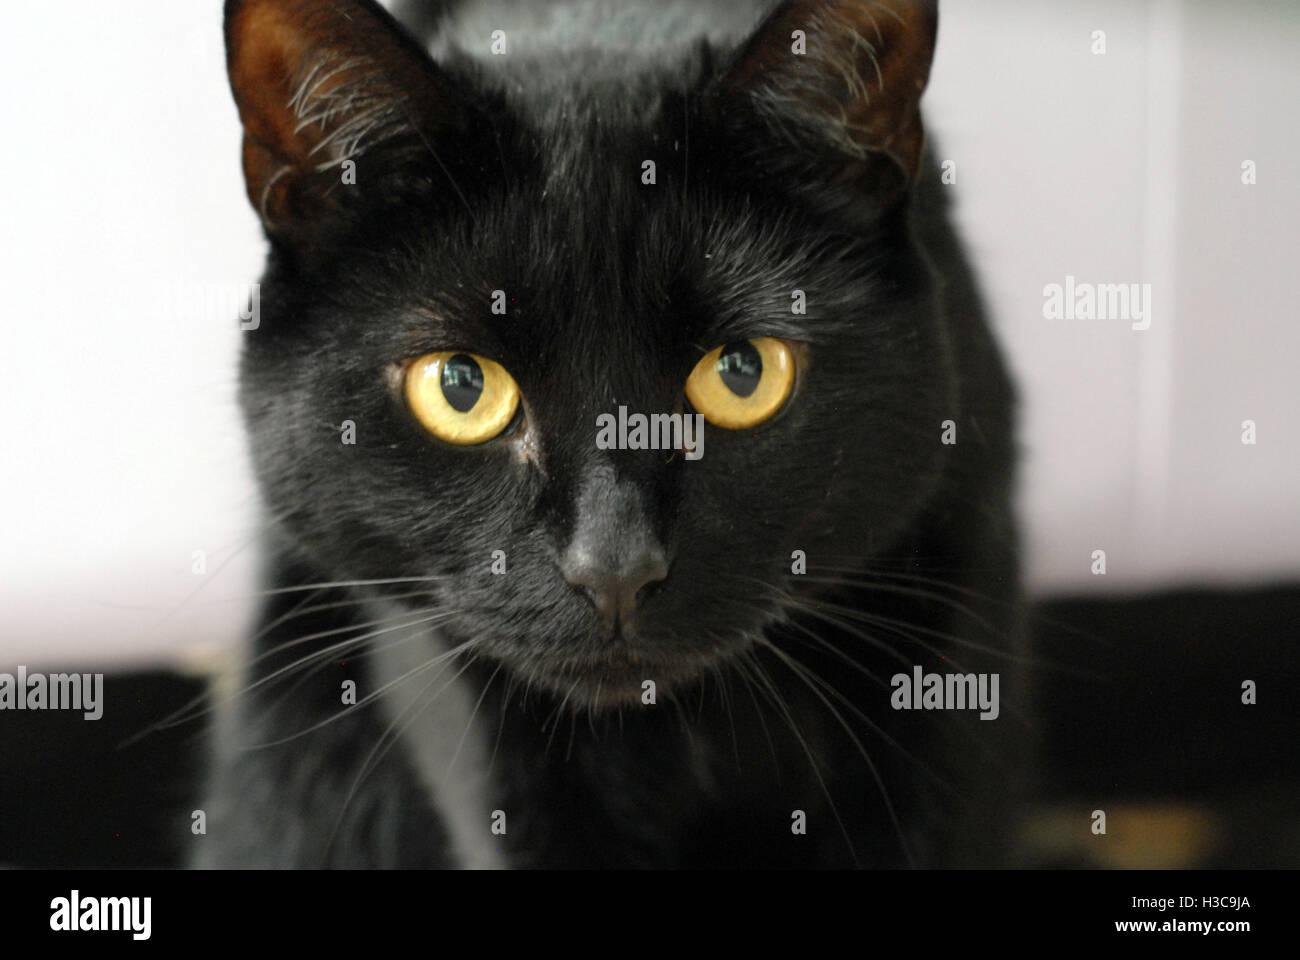 Schwarze Katze Mit Gelben Augen Kopf Closeup Stockfotografie Alamy